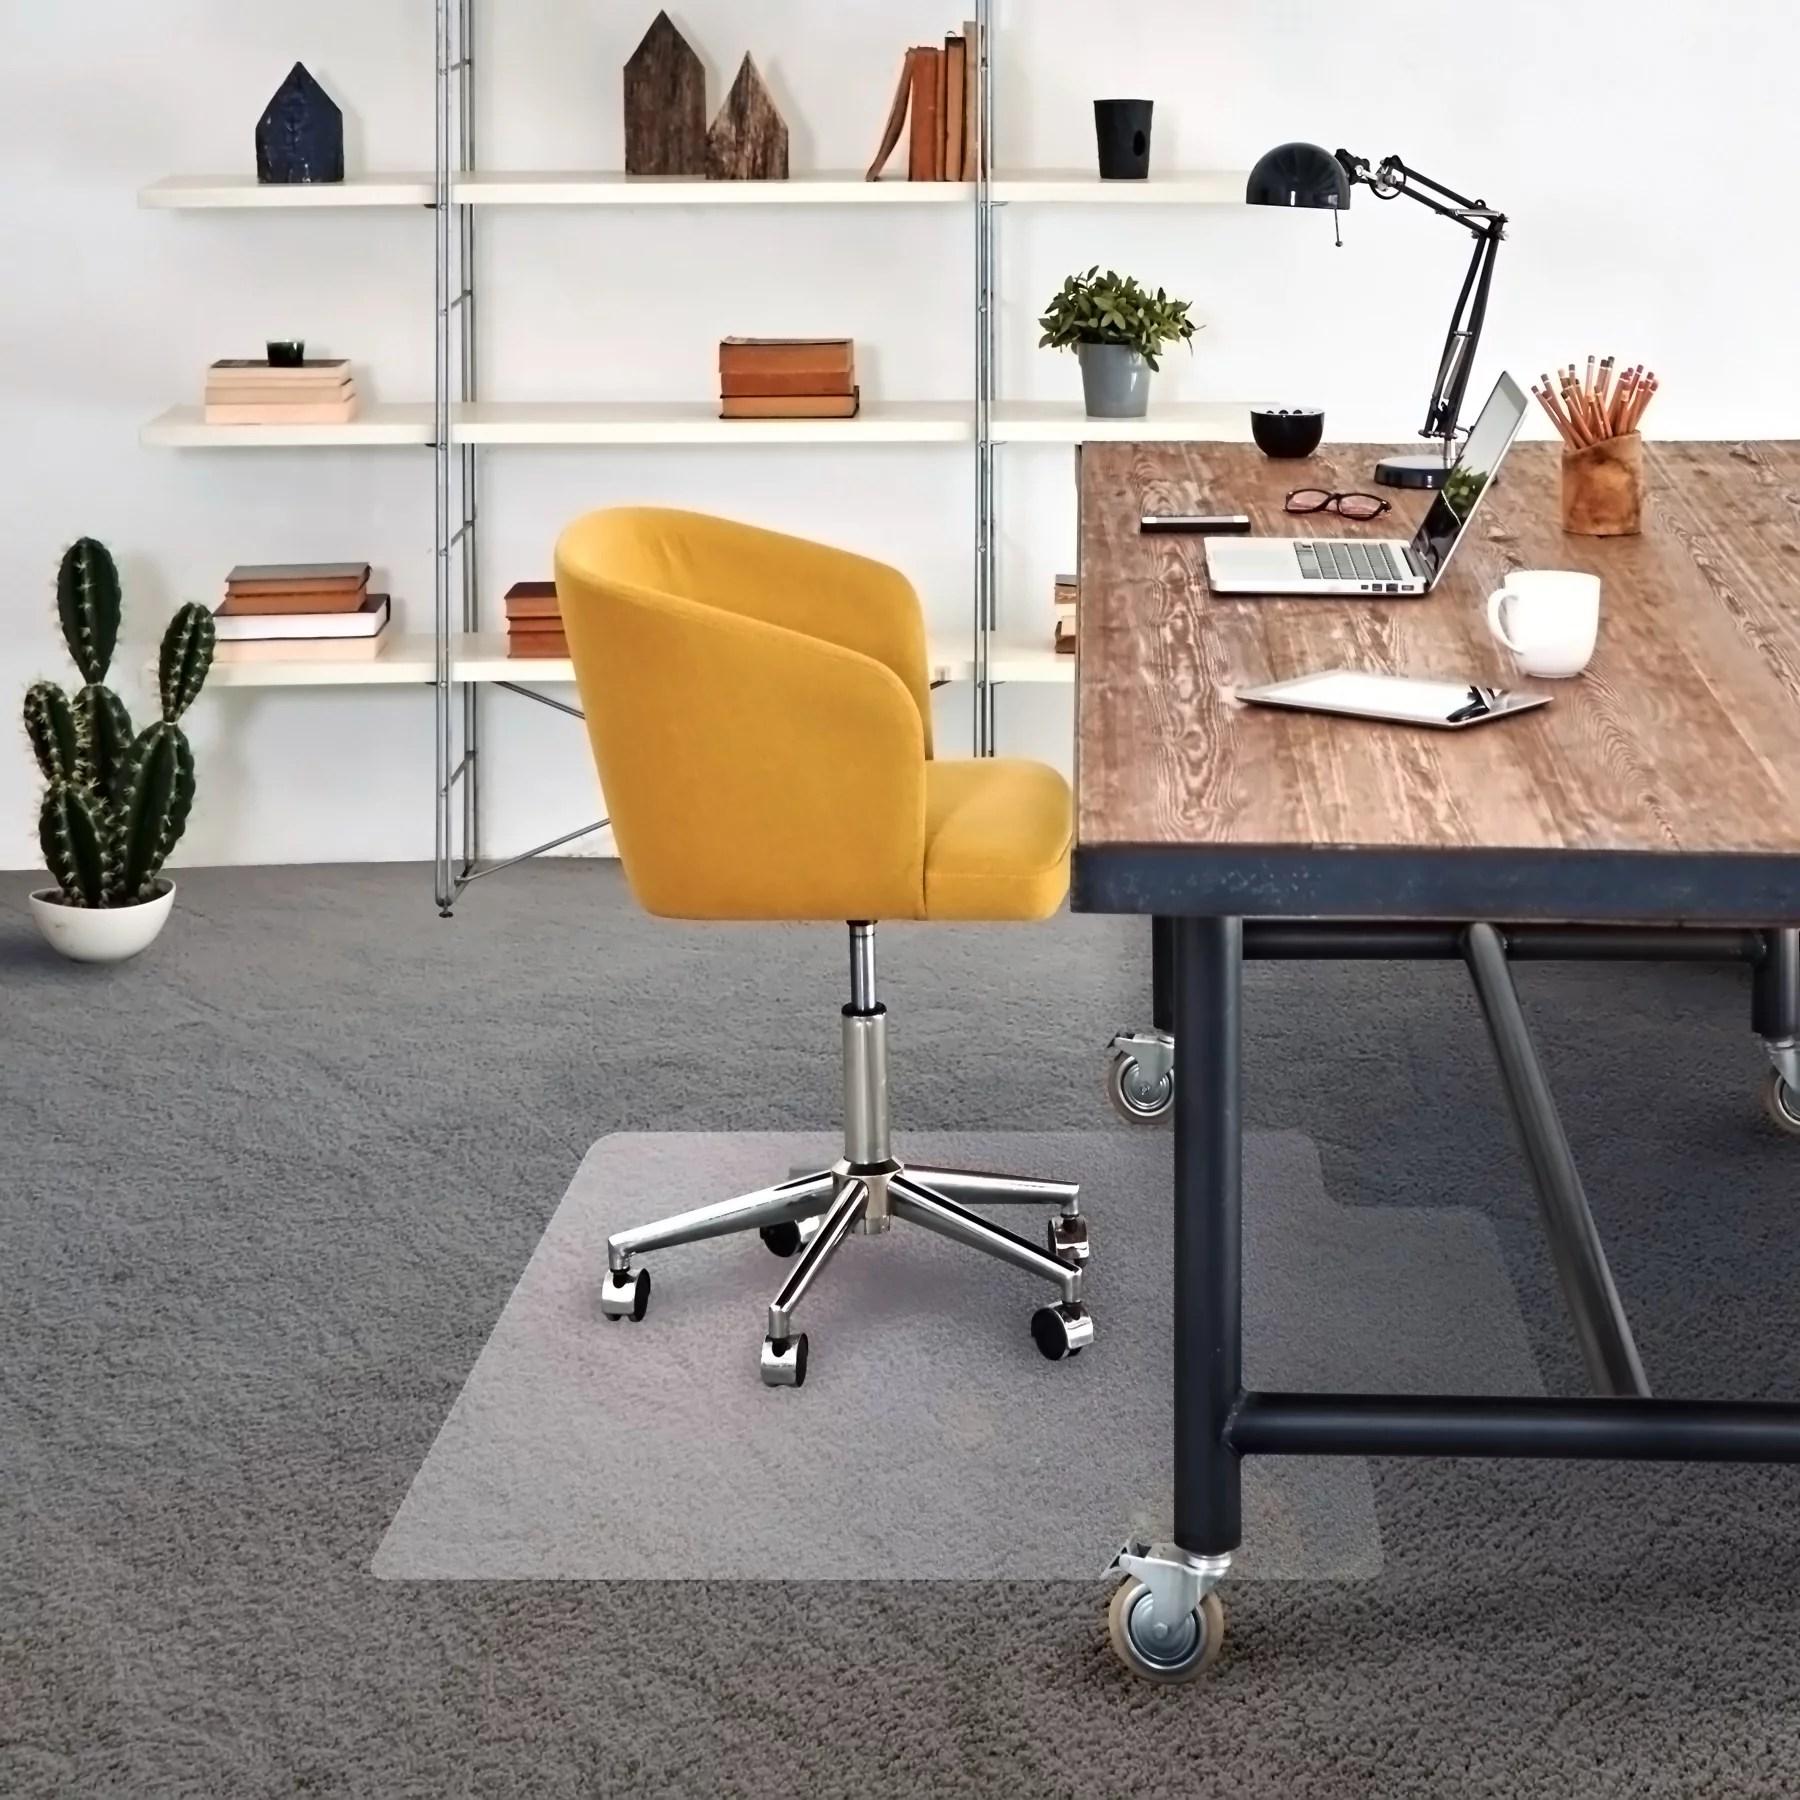 desk chair mat for carpet inexpensive covers cleartex advantagemat low pile carpets clear pvc rectangular with lip size 36 x 48 walmart com